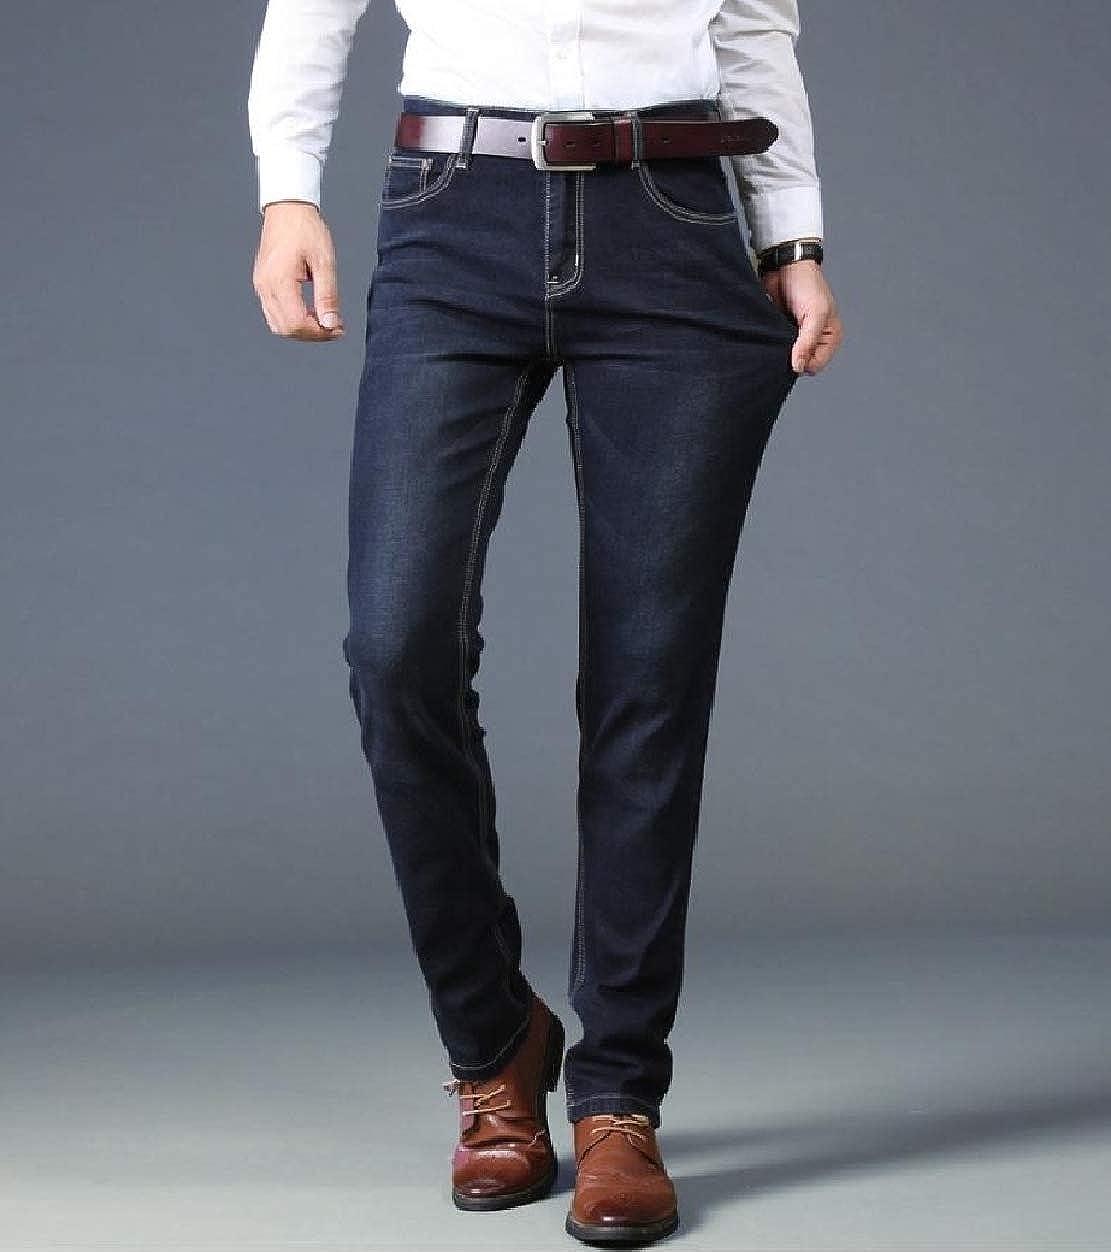 Howme Mens Denim Pants Washed Stretch Slim Fitting Big Tall Jeans